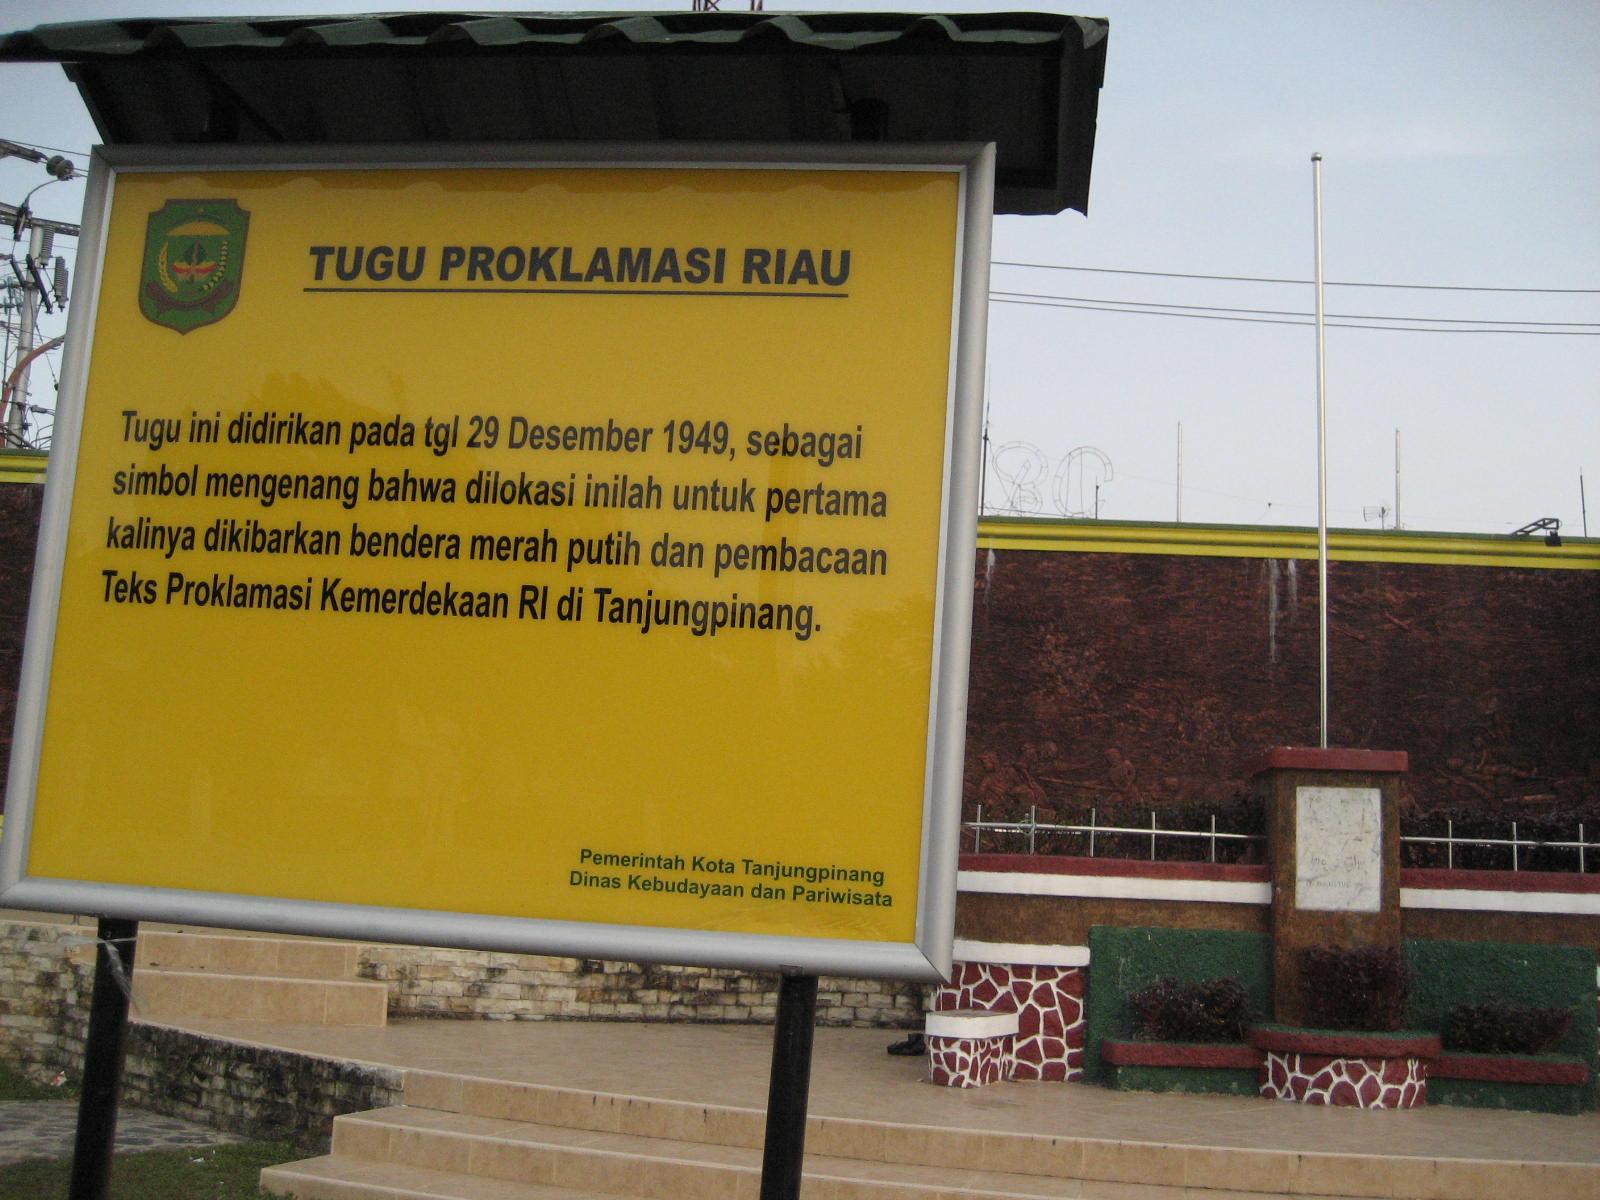 Berkas Tugu Proklamasi Riau Jpg Wikipedia Bahasa Indonesia Kota Tanjungpinang